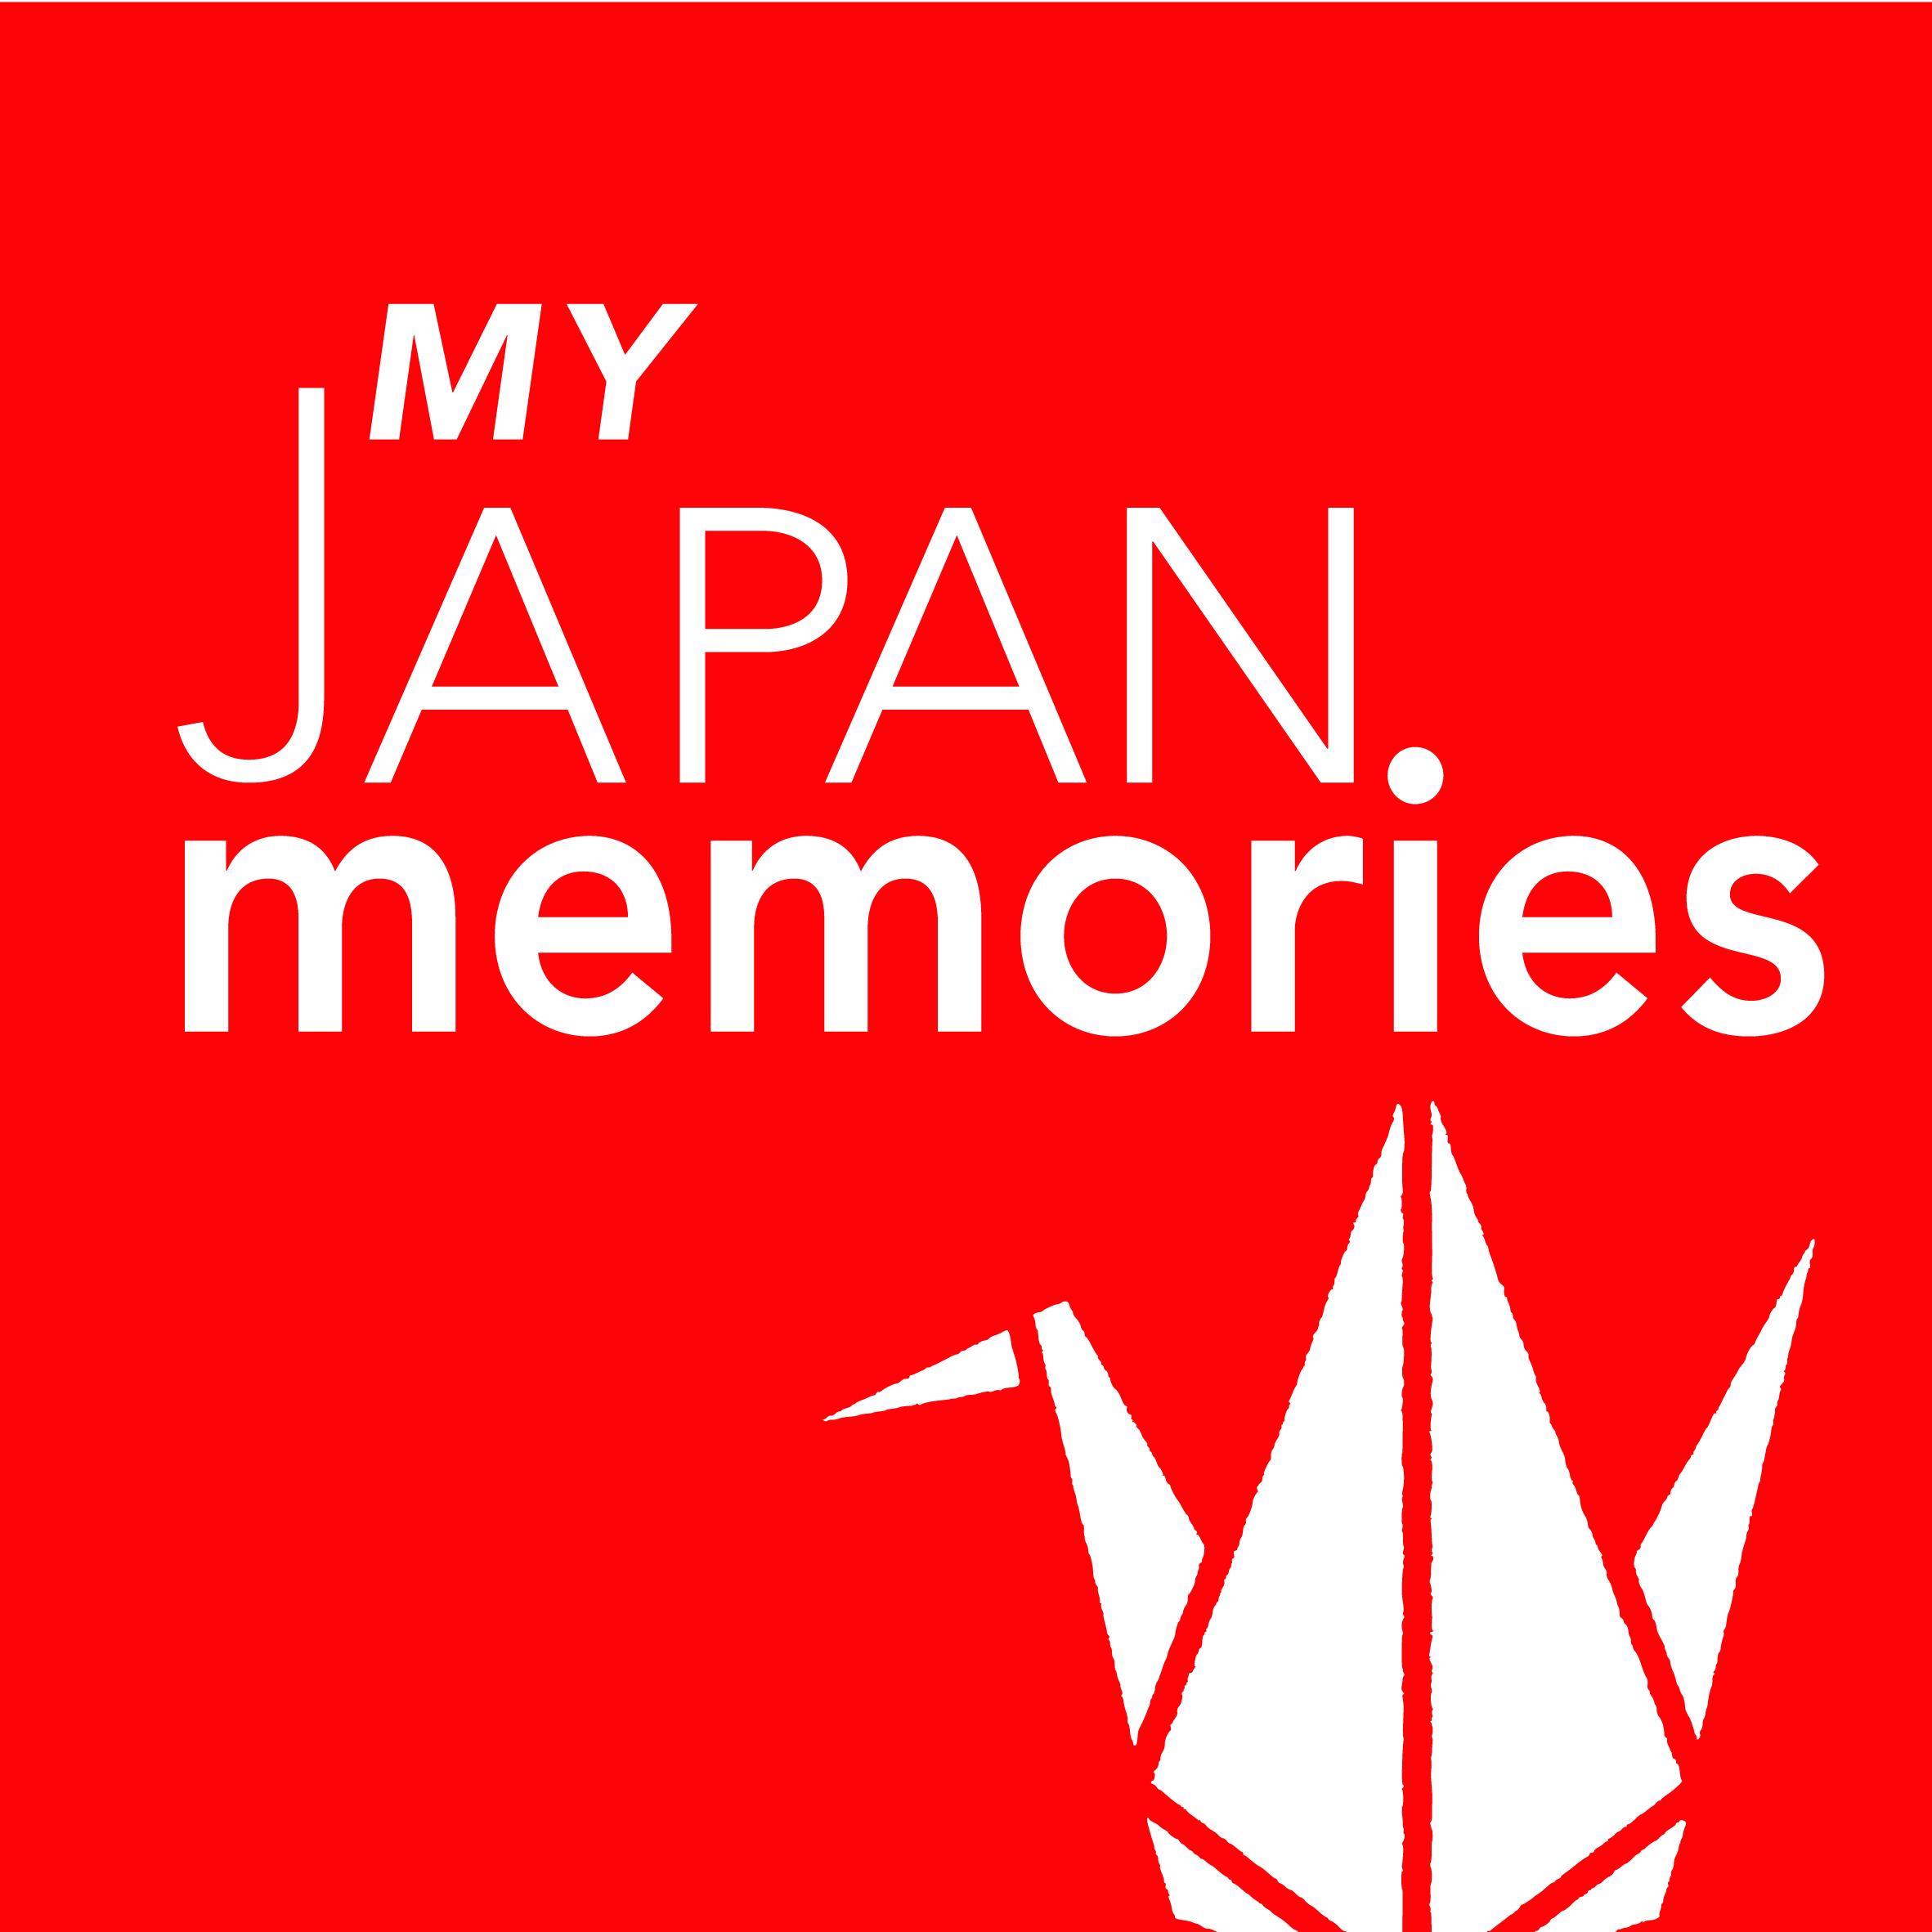 MyJapanMemoriesLogo(CMYK_print)jpg.jpeg